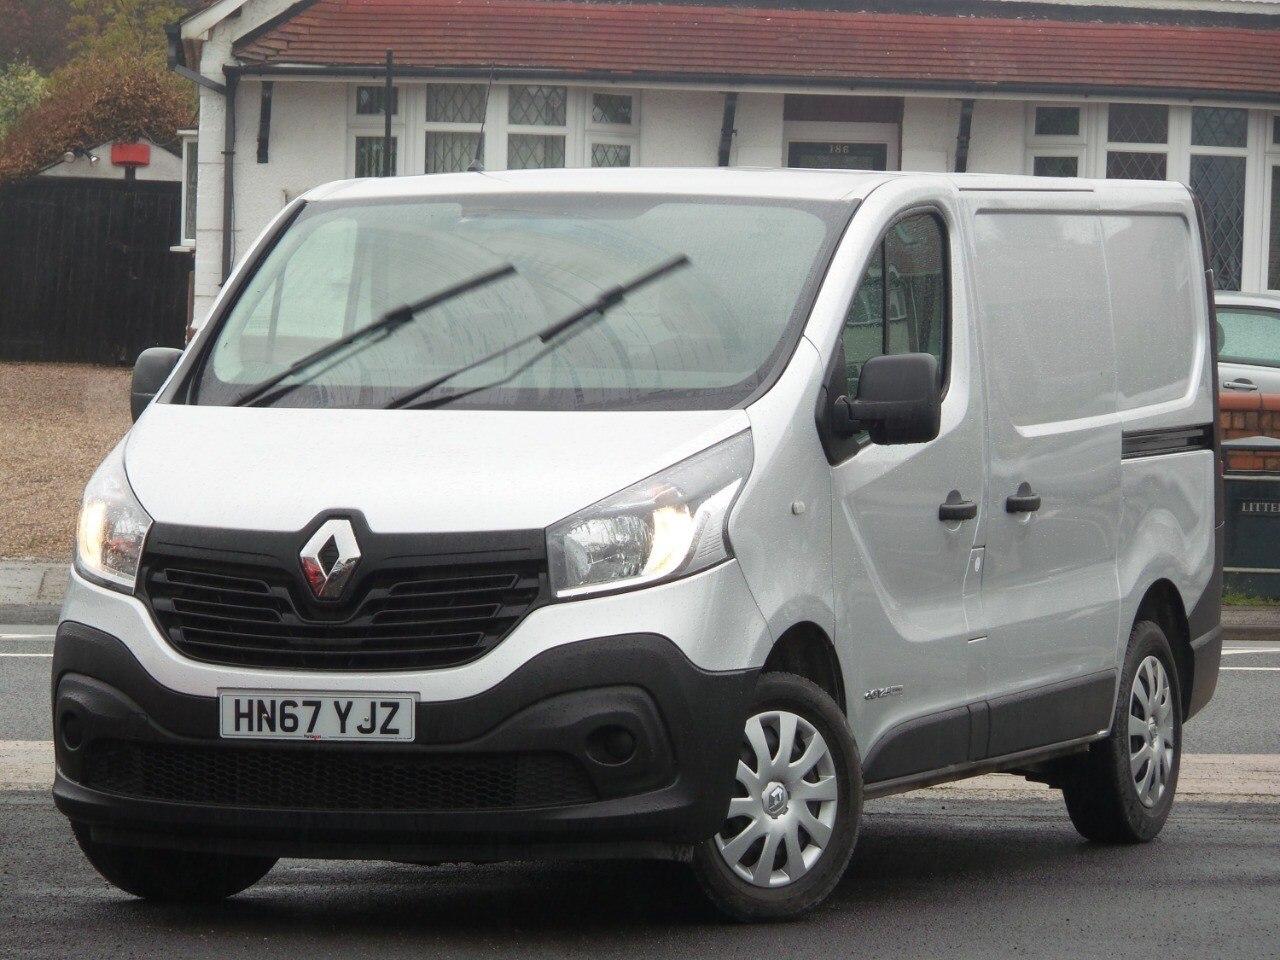 9055a4515e 890 Used Vans for sale in Nottingham at Motors.co.uk